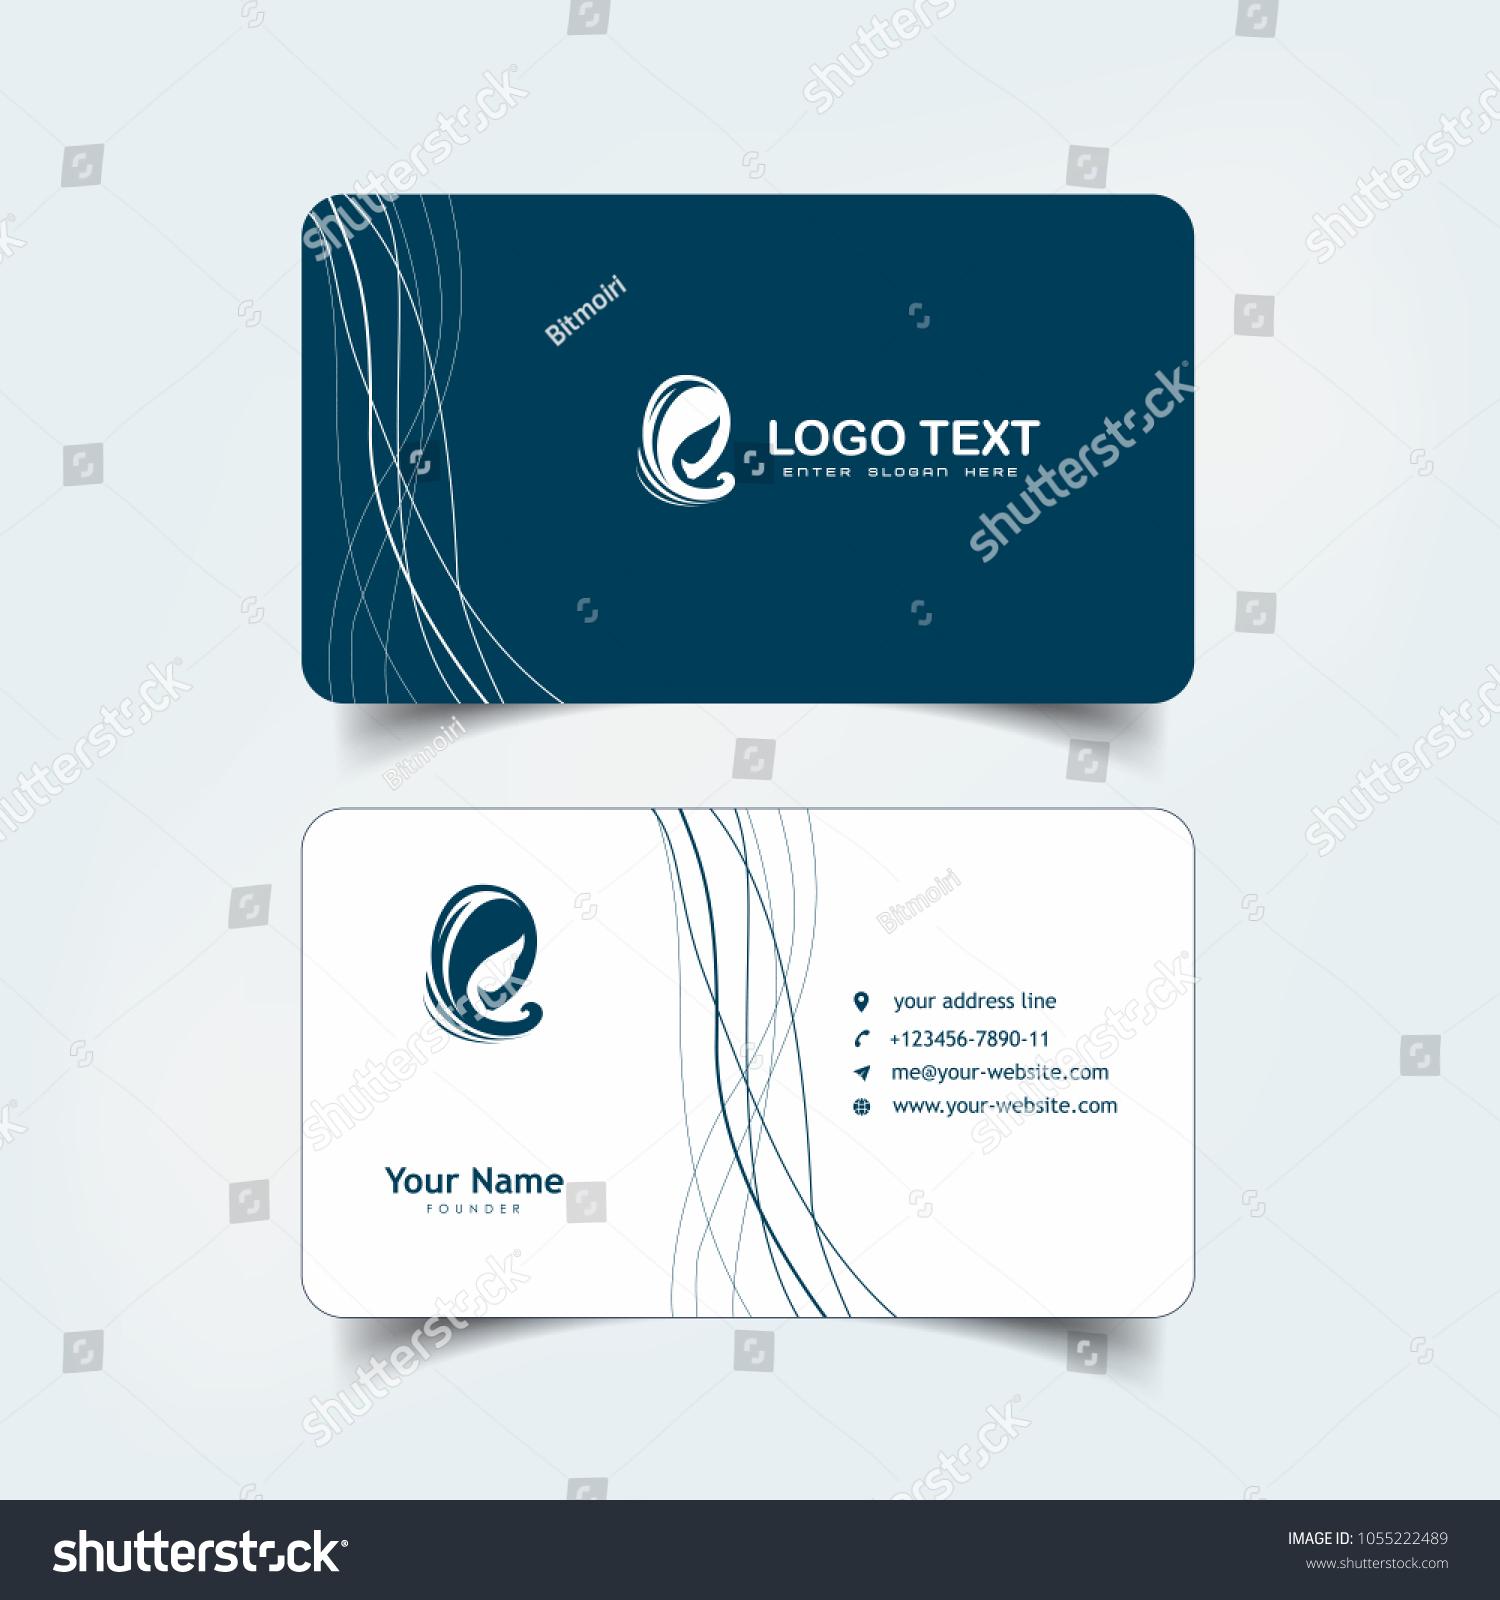 Simple Elegant Business Card Templates Hair Stock Photo (Photo ...